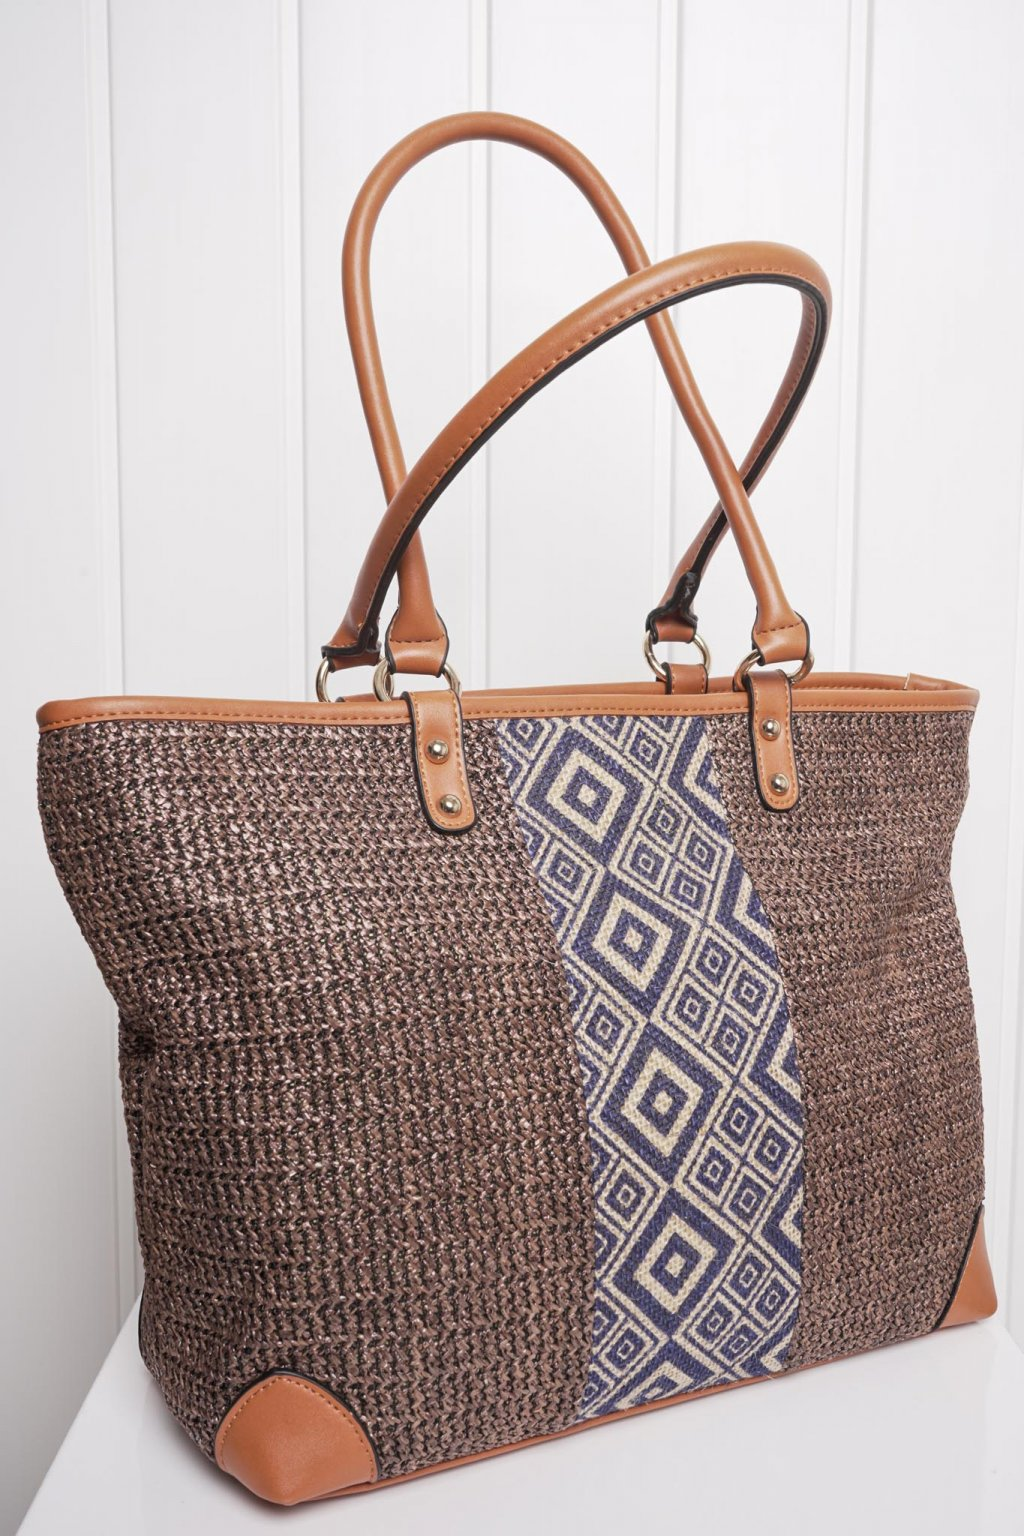 Kabelka, ruksak, dobrá cena, čierna kabelka, čierny ruksak, basic, kabelky, ruksaky 141